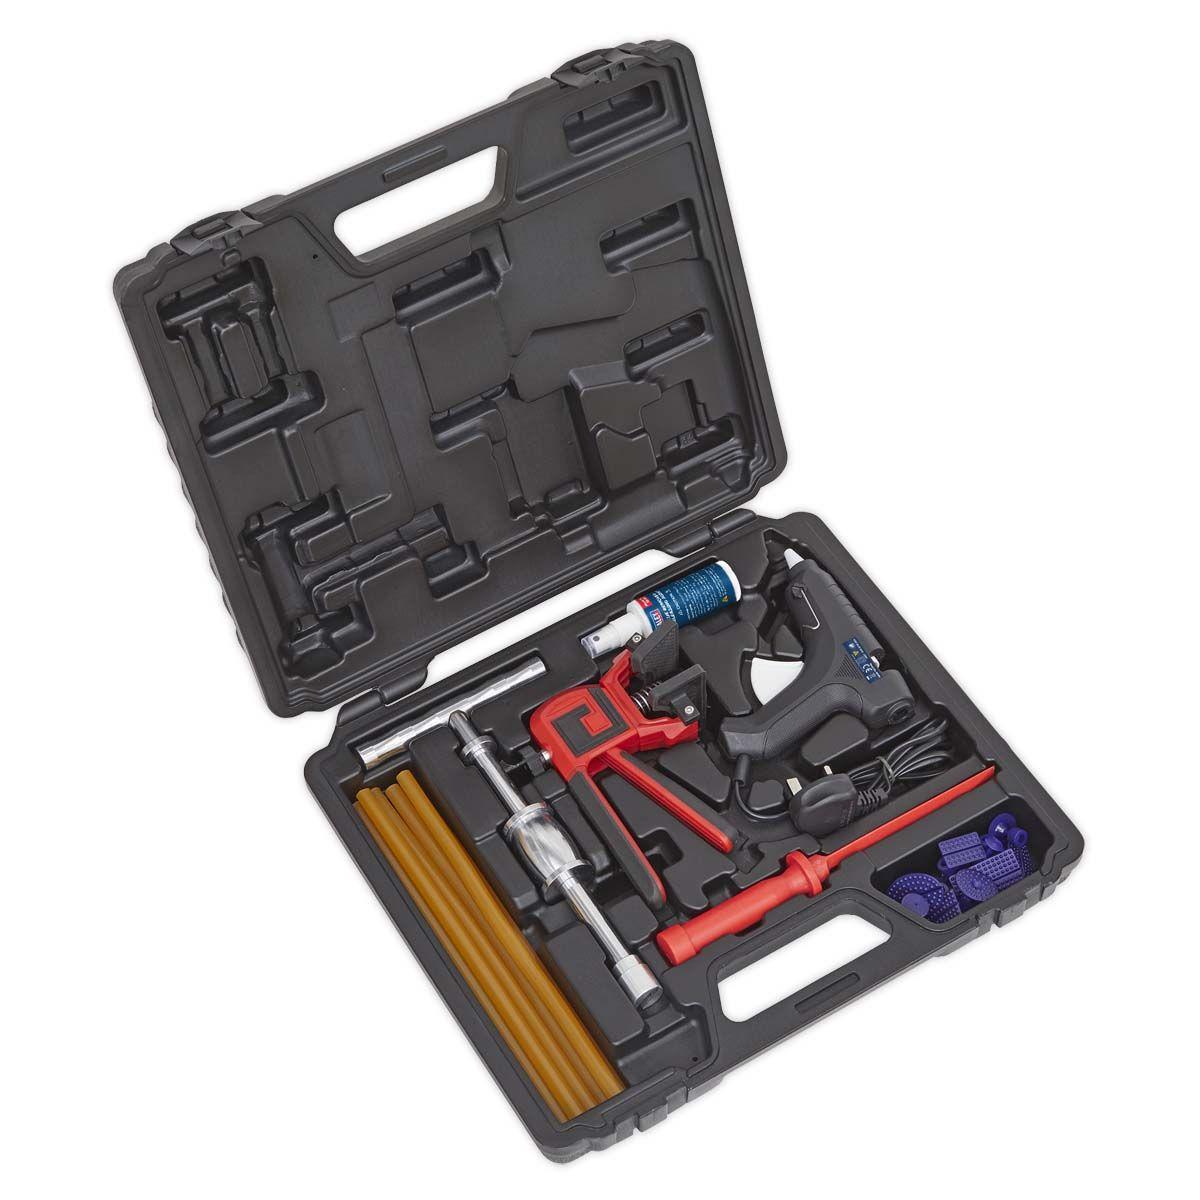 Sealey Hot Glue Paintless Dent Repair Kit 230V